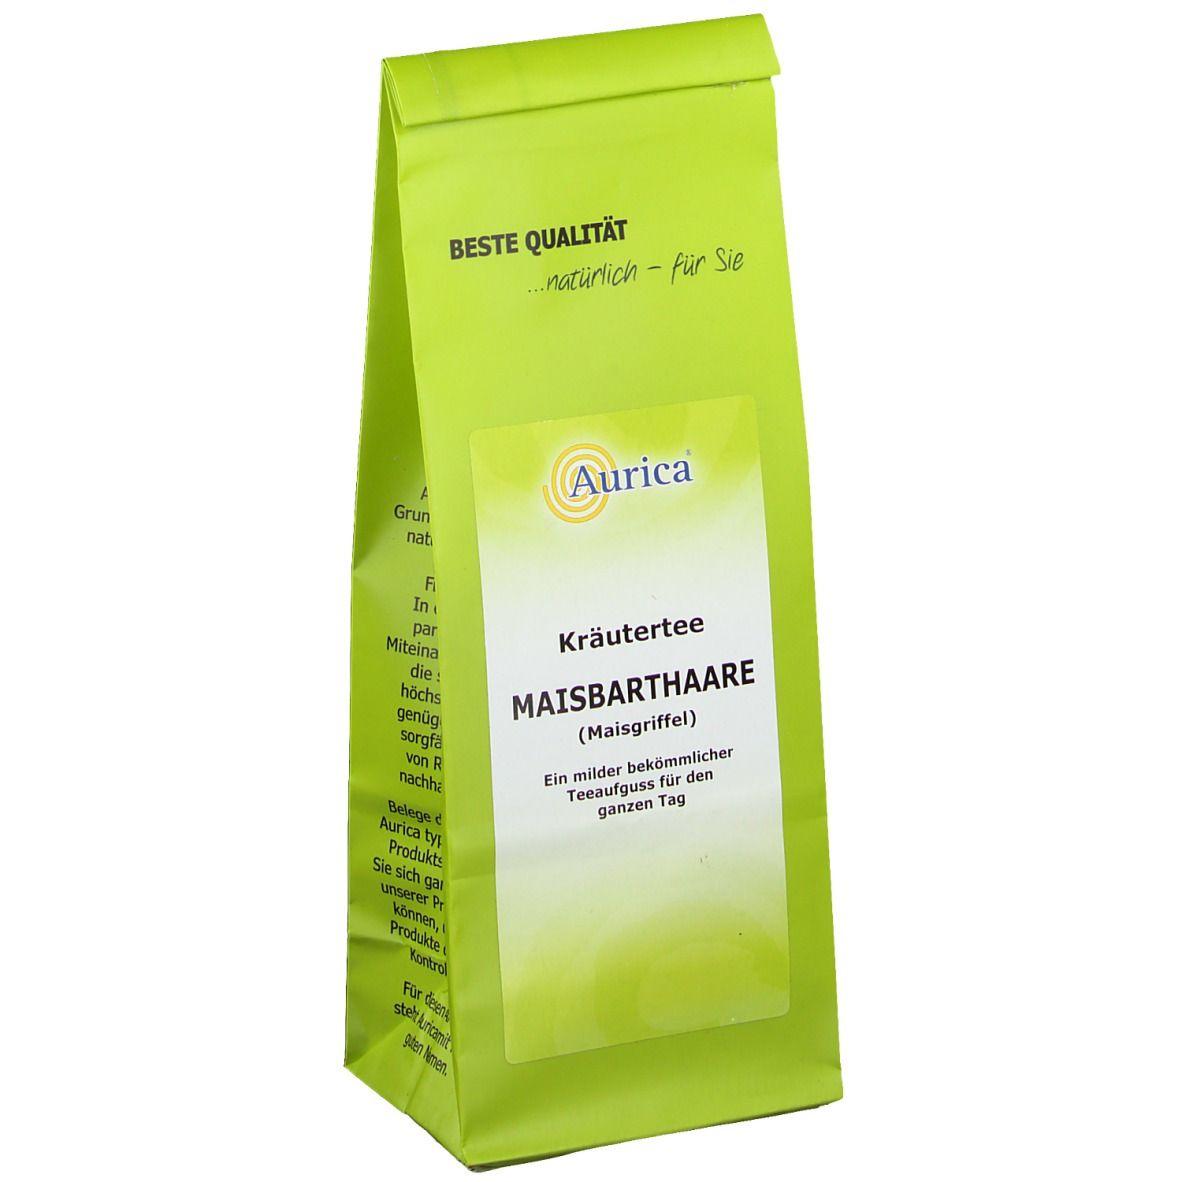 Aurica® Maisbarthaare Tee